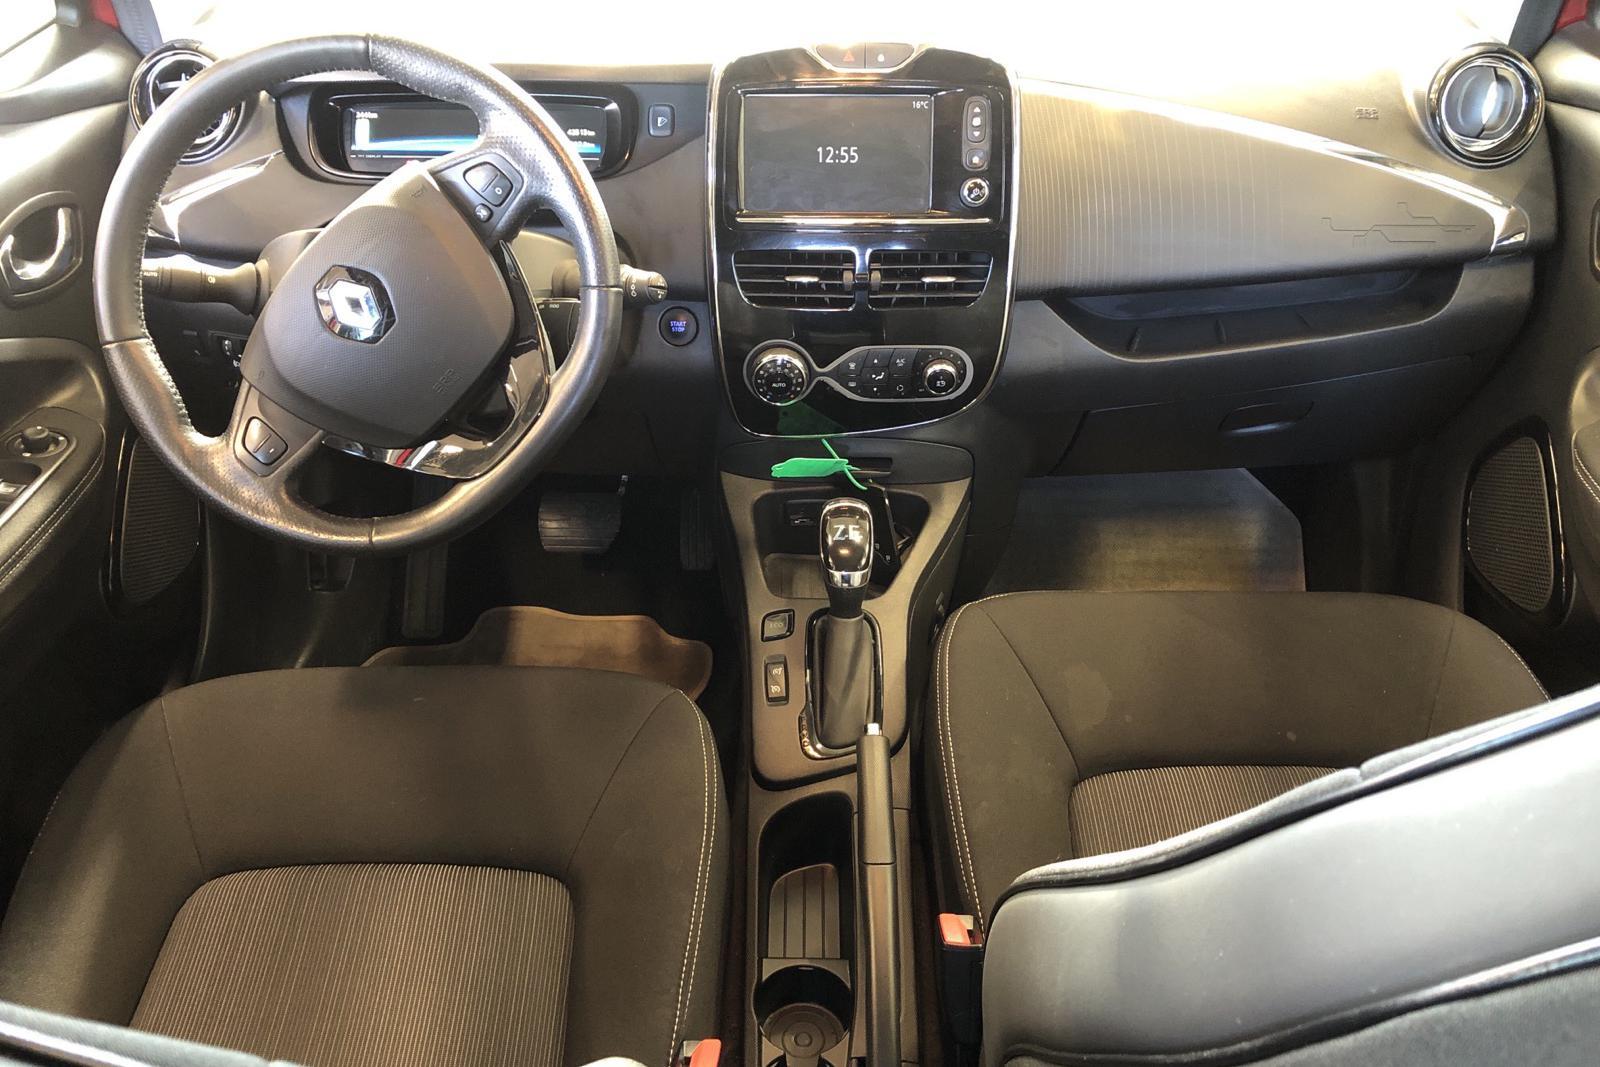 Renault Zoe 41 kWh R110 (108hk) - 4 251 mil - Automat - röd - 2018